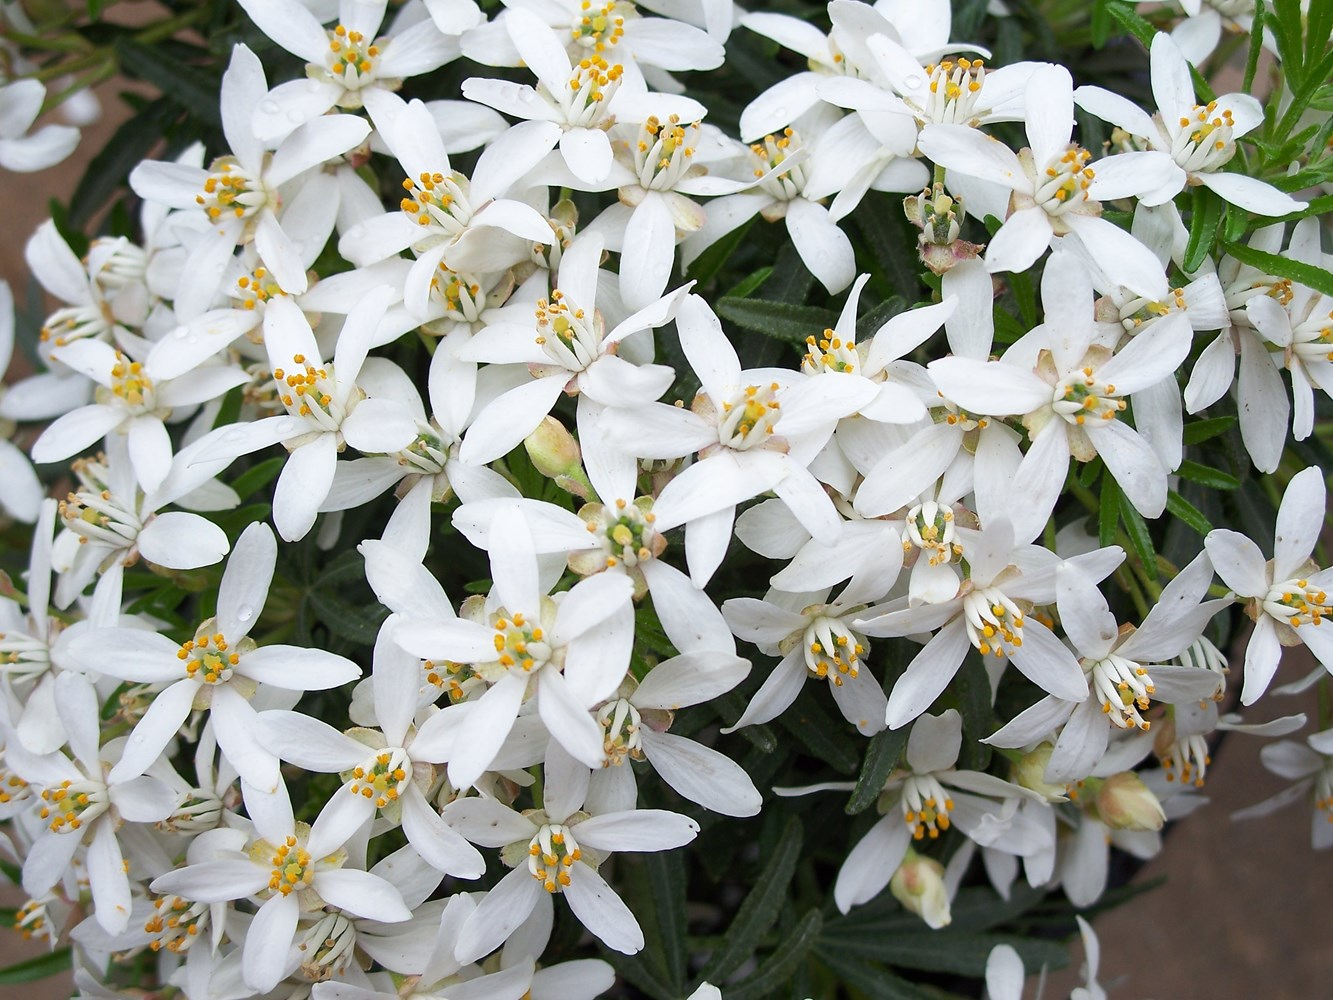 Website/Plants/1727730299/Images/Gallery/c_whitedazzler_02.0.JPG